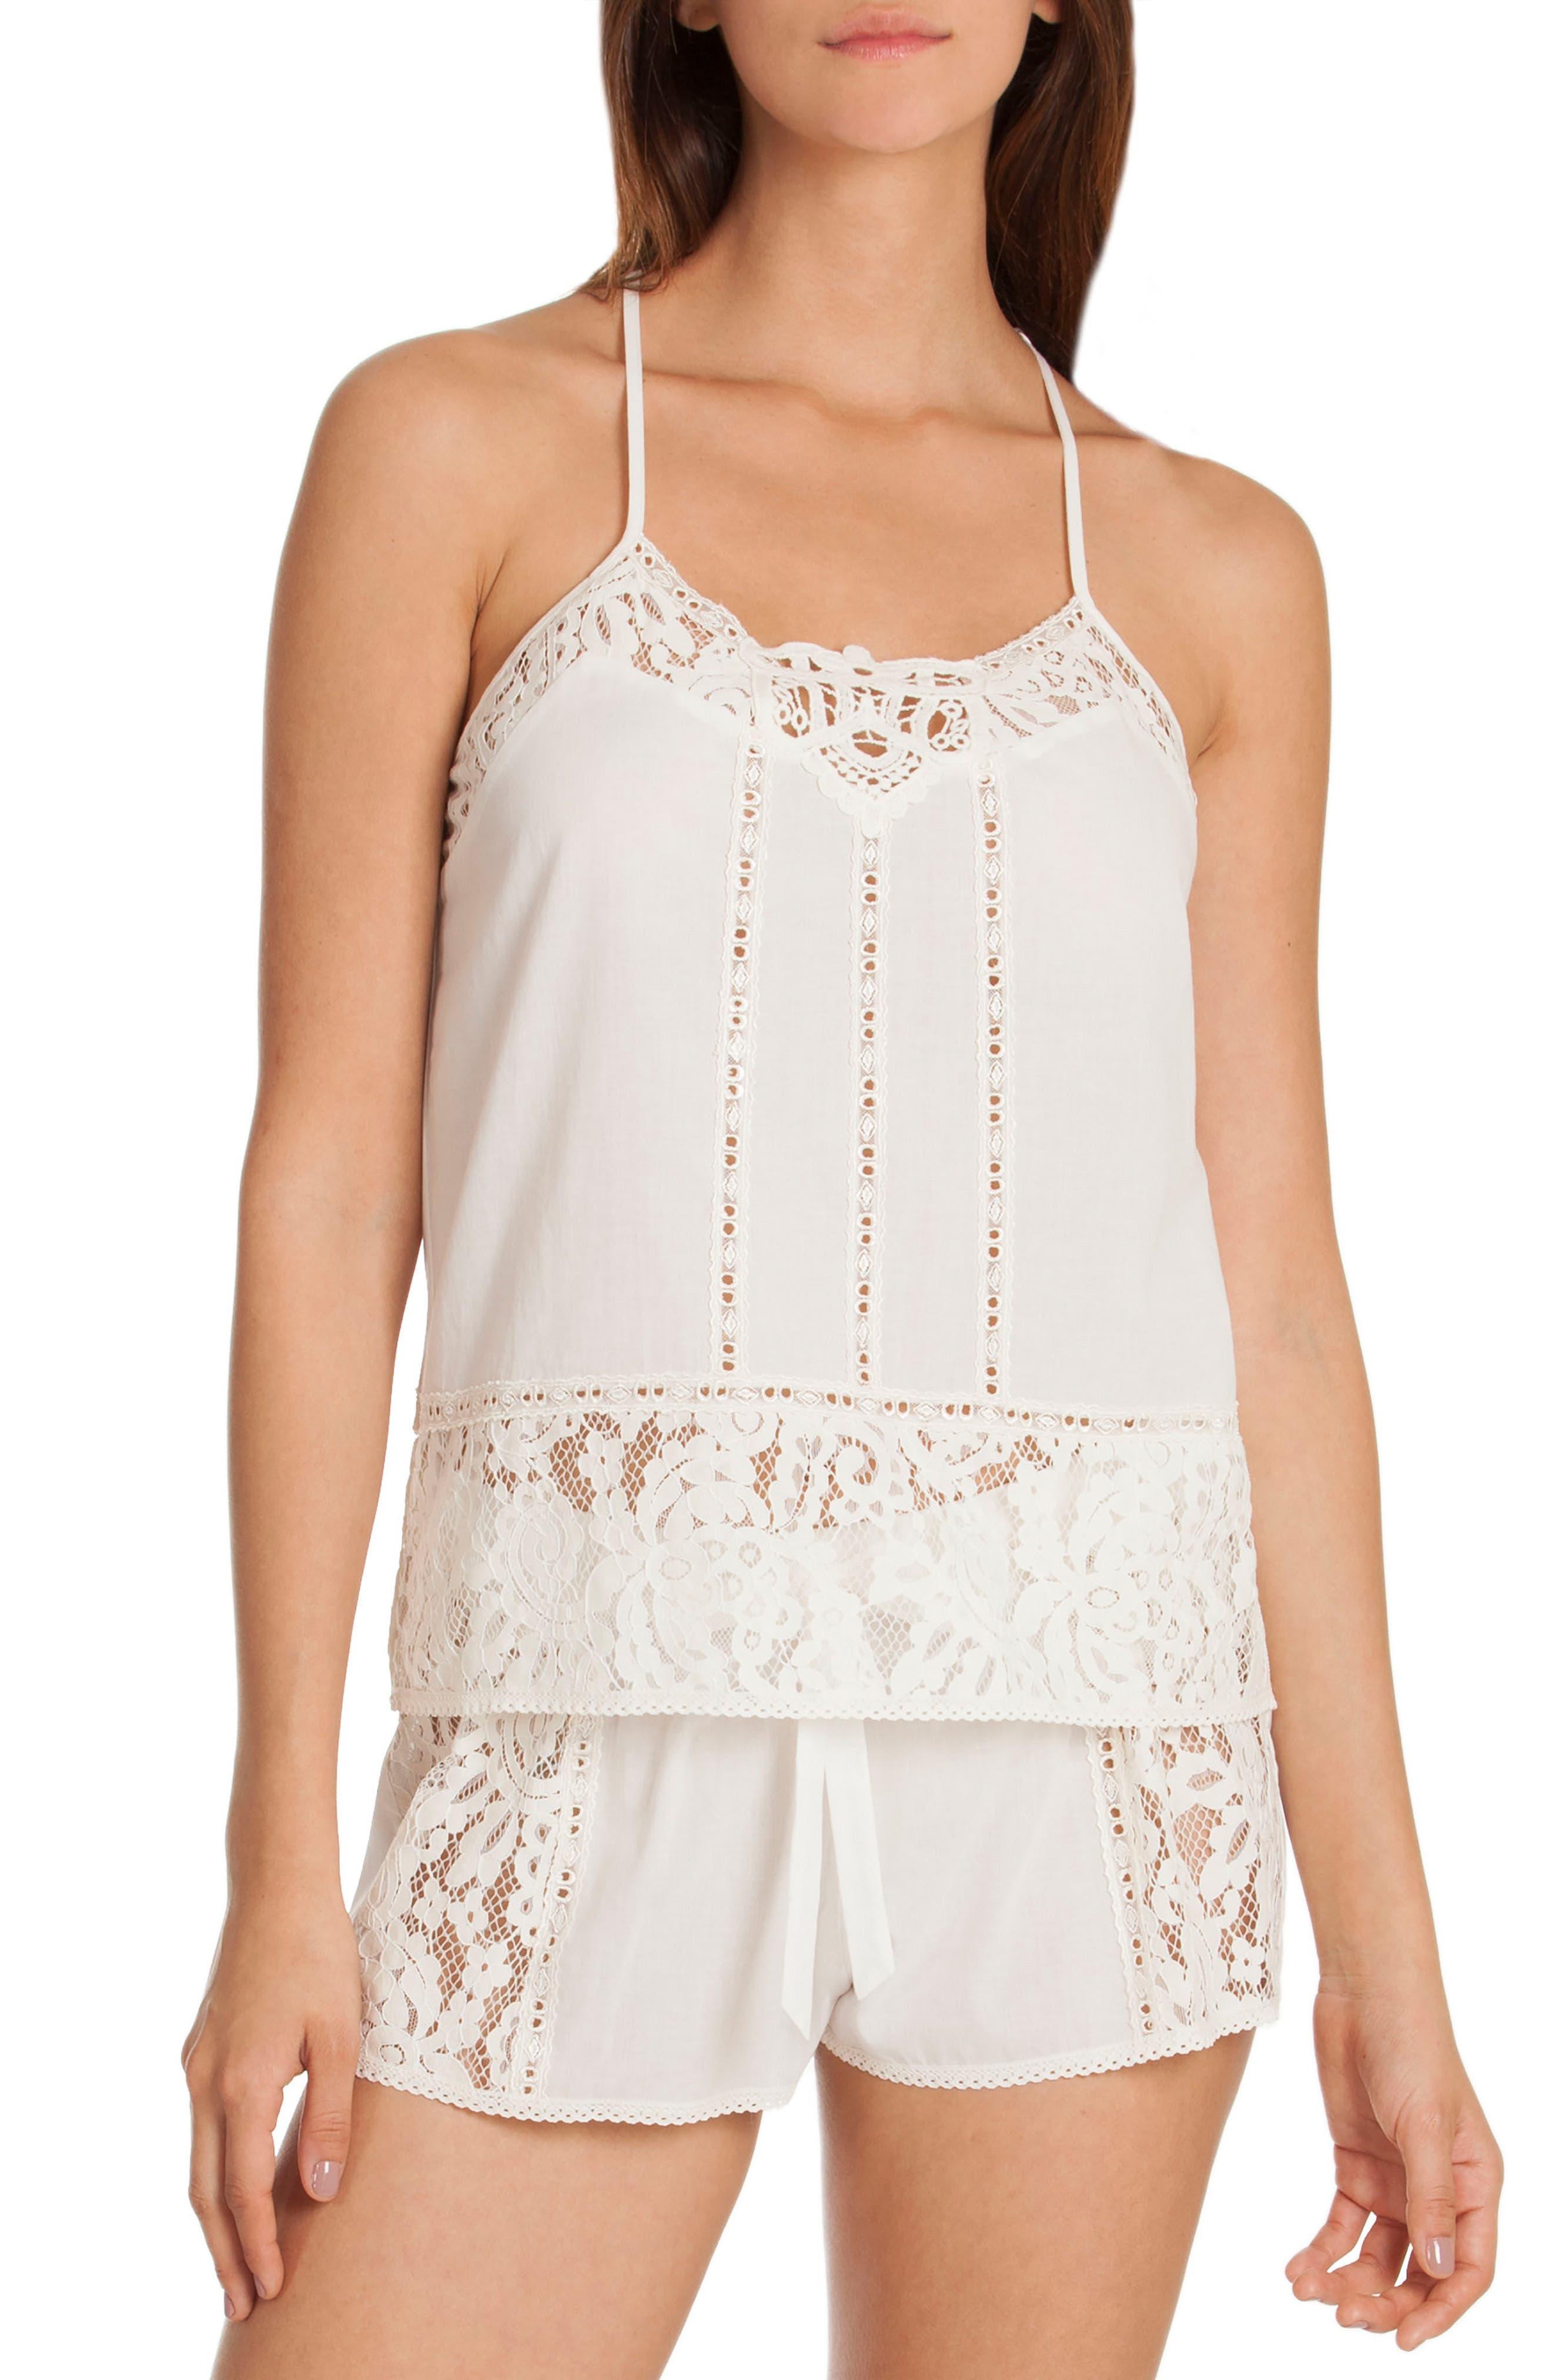 Eyelet Cotton Short Pajamas,                             Main thumbnail 1, color,                             Ivory/ Beige